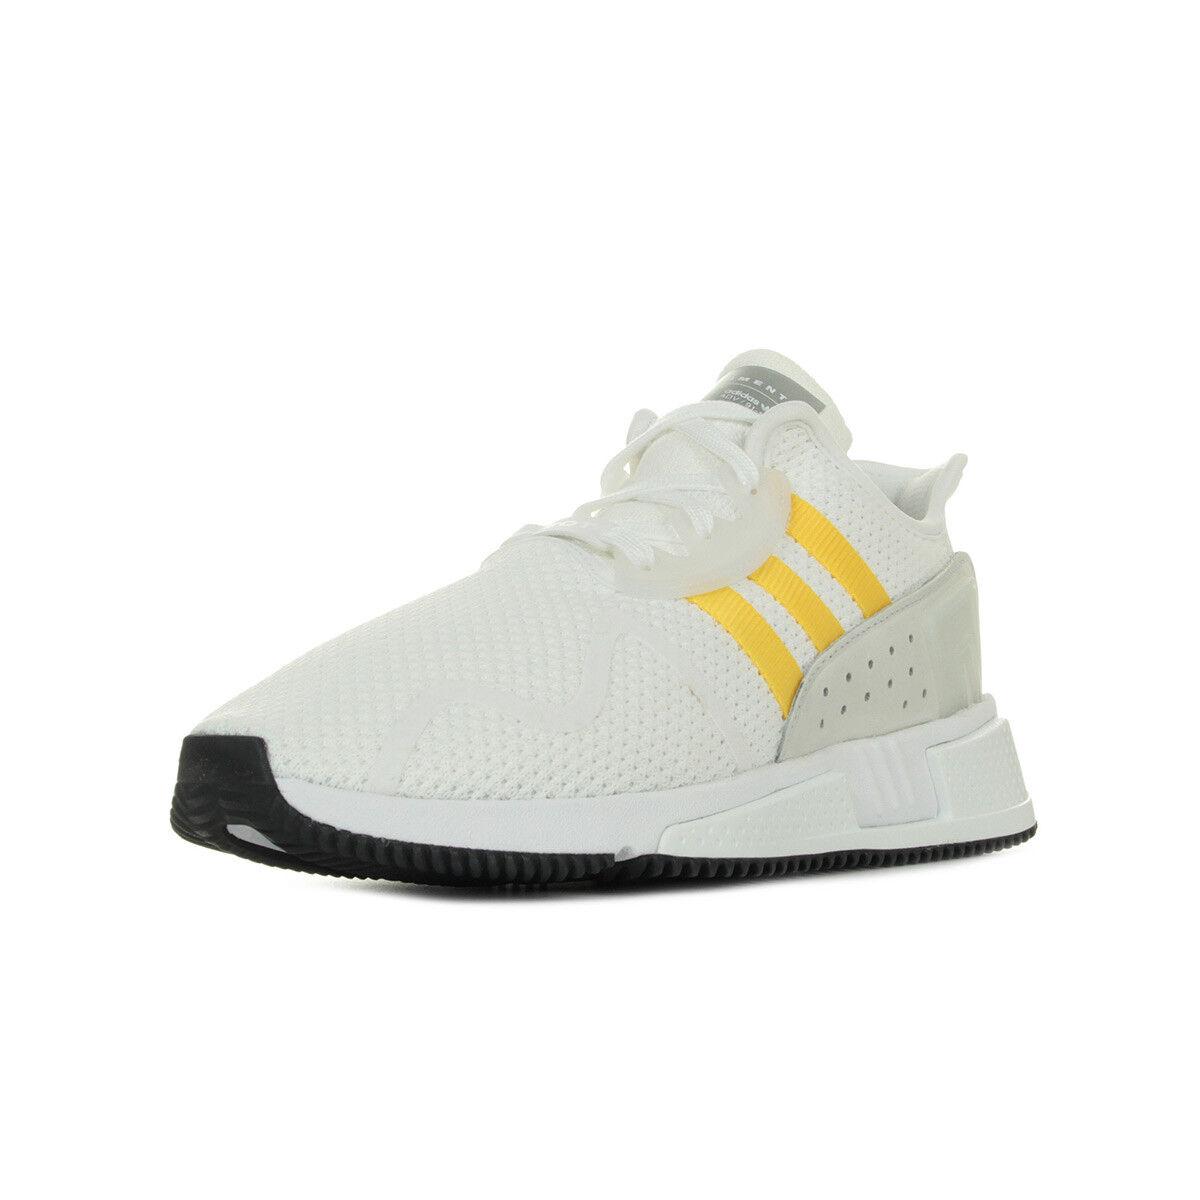 Chaussures Adidas hommes EQT Cushion ADV blanc